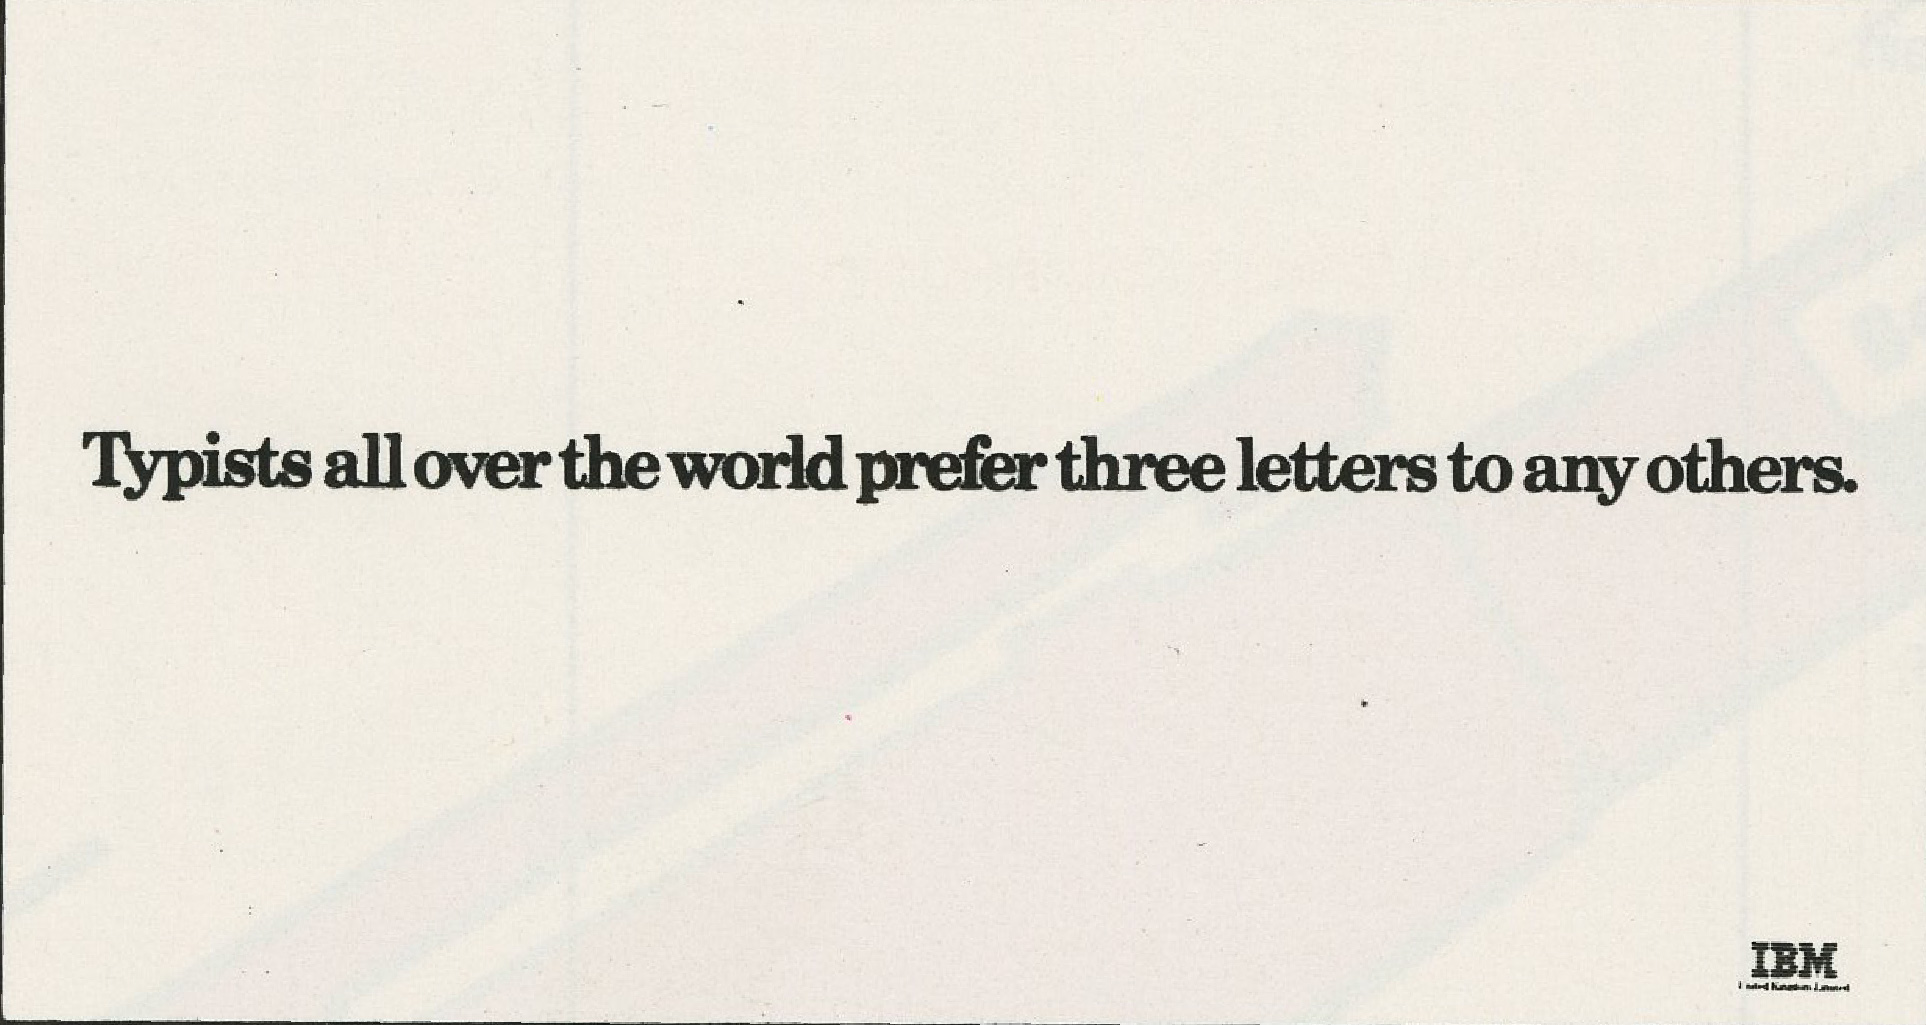 HMS. IBM '3 letters'-01